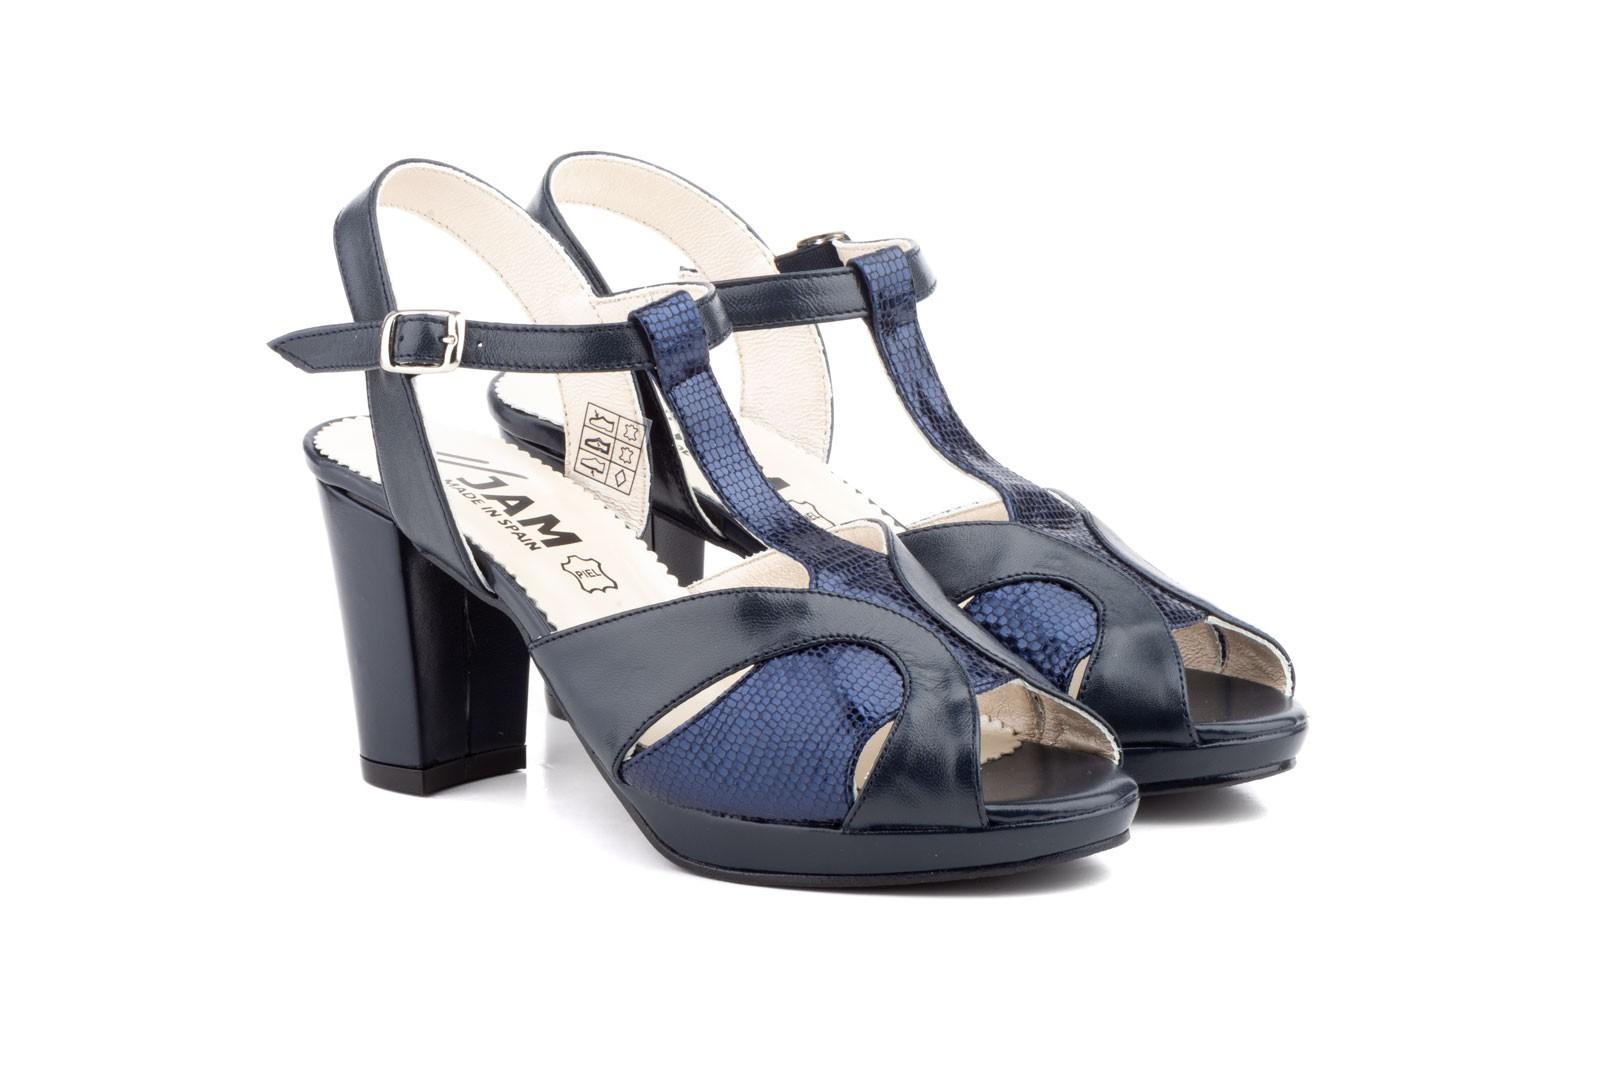 Shoes Woman Sea Leather Platform Heel JAM JAM-551559,90€